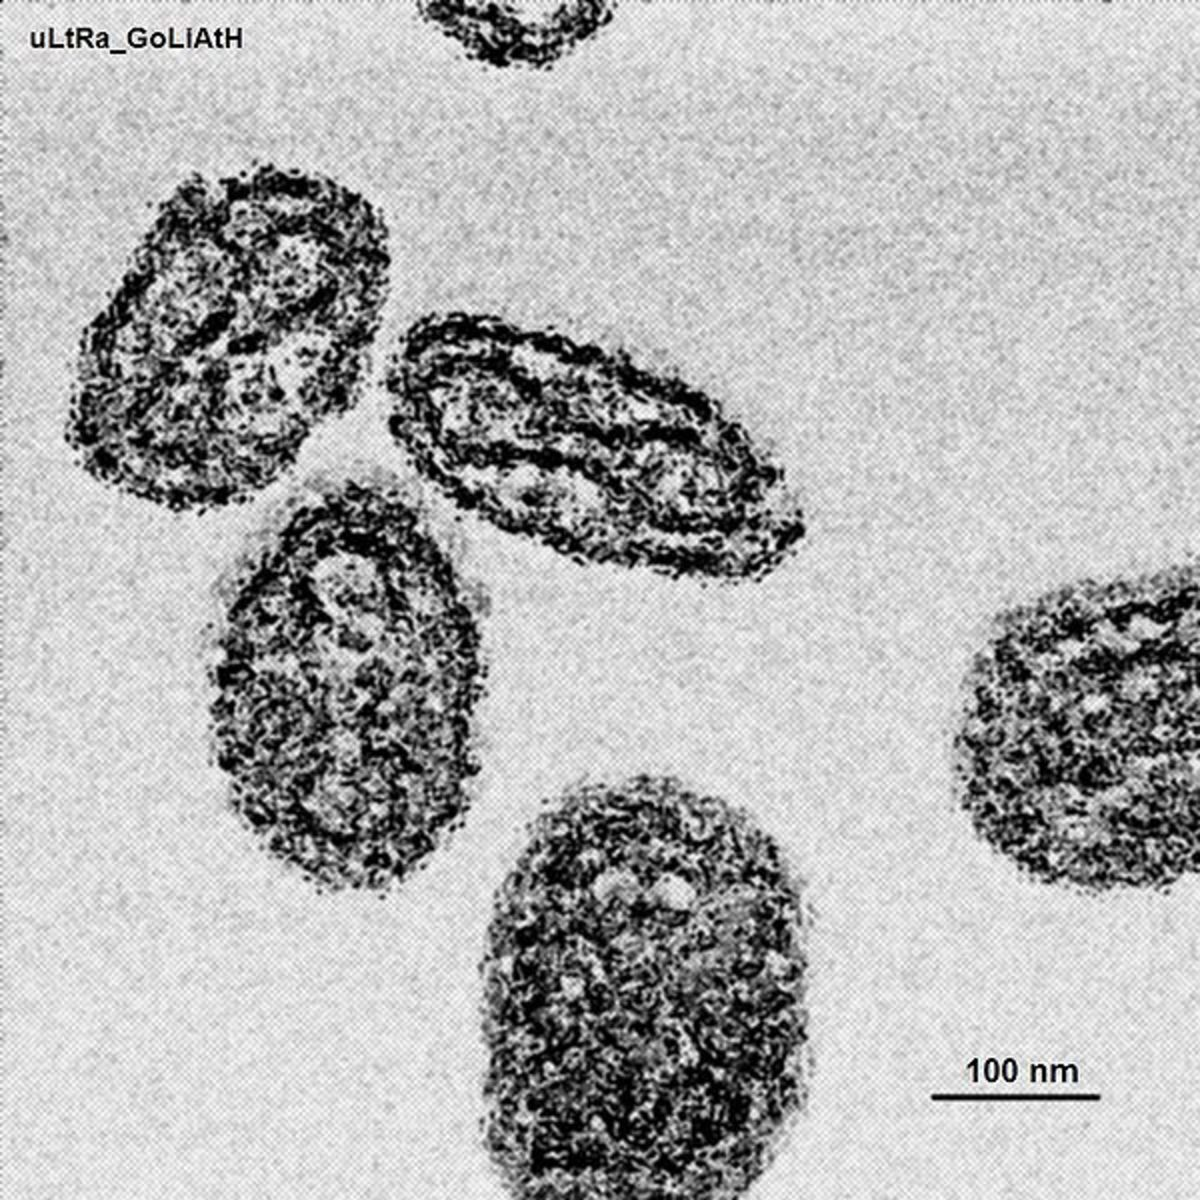 Smallpox virus